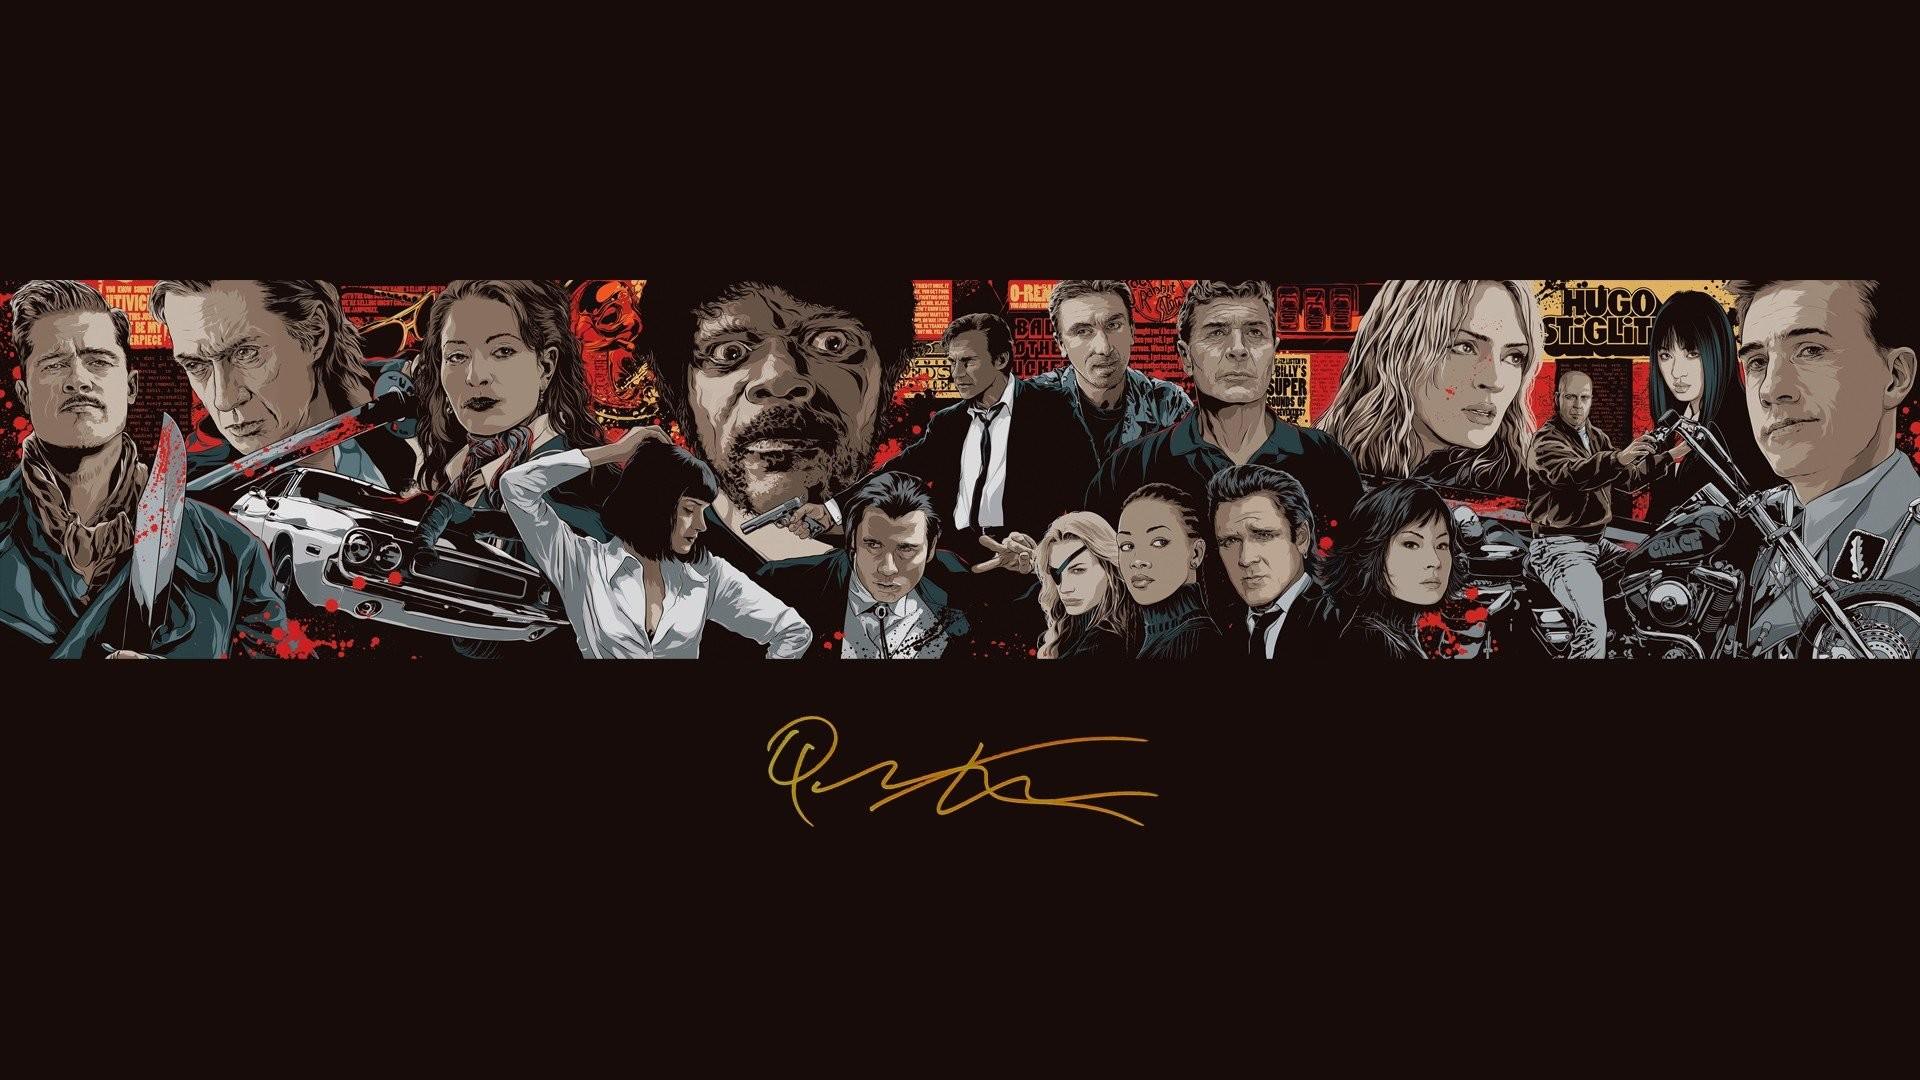 Brad Pitt Bruce Willis Christoph Waltz Death Proof Directors Films  Inglorious Basterds Jackie Brown John Travolta Kill Bill Lucy Liu Pulp  Fiction Quentin …